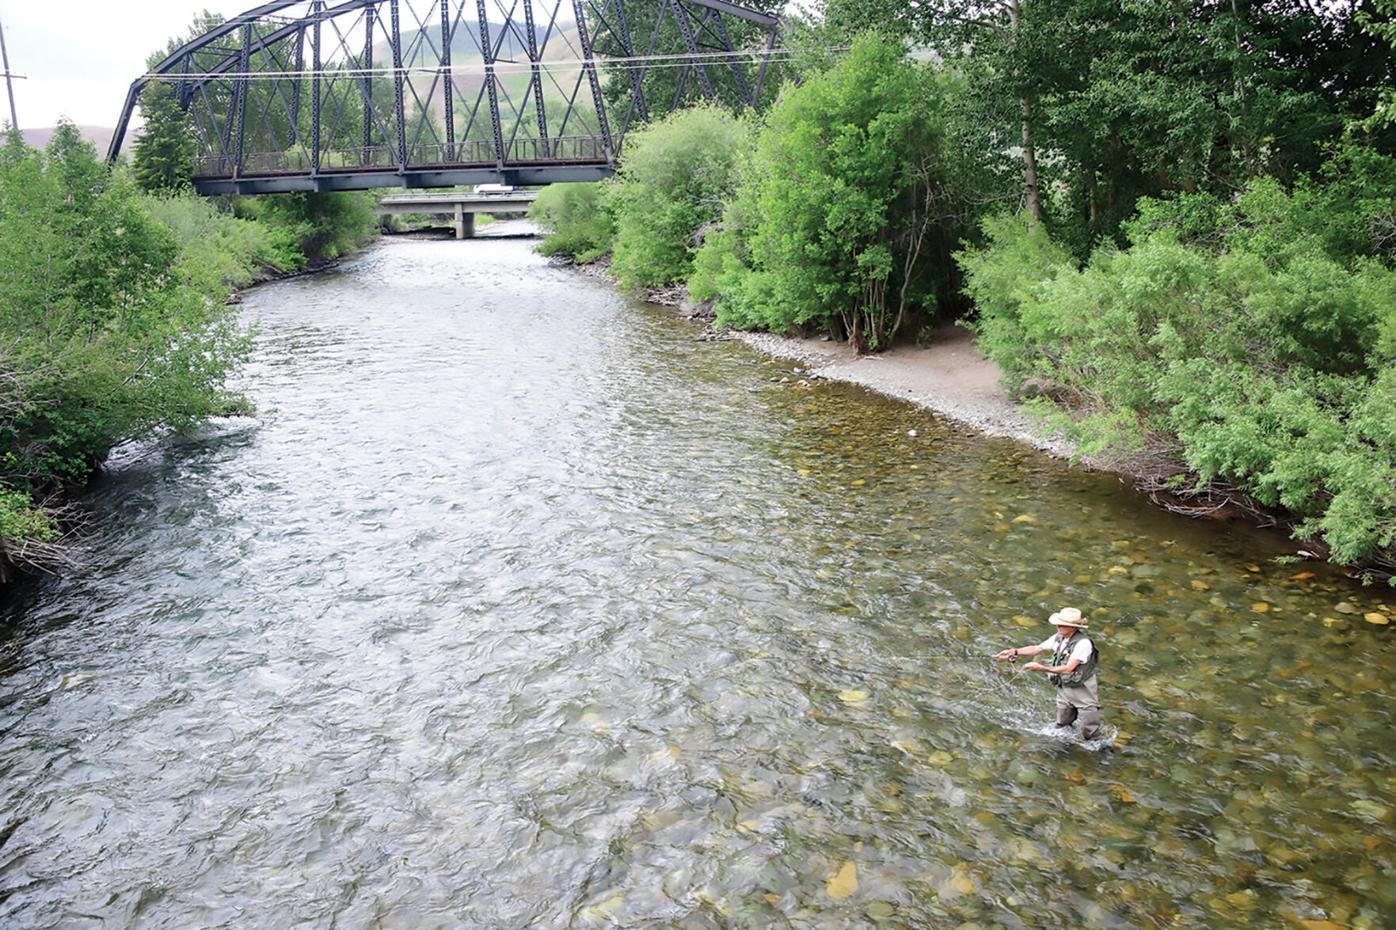 20-07-08 Bigwood river Fishing 3 Roland.jpg